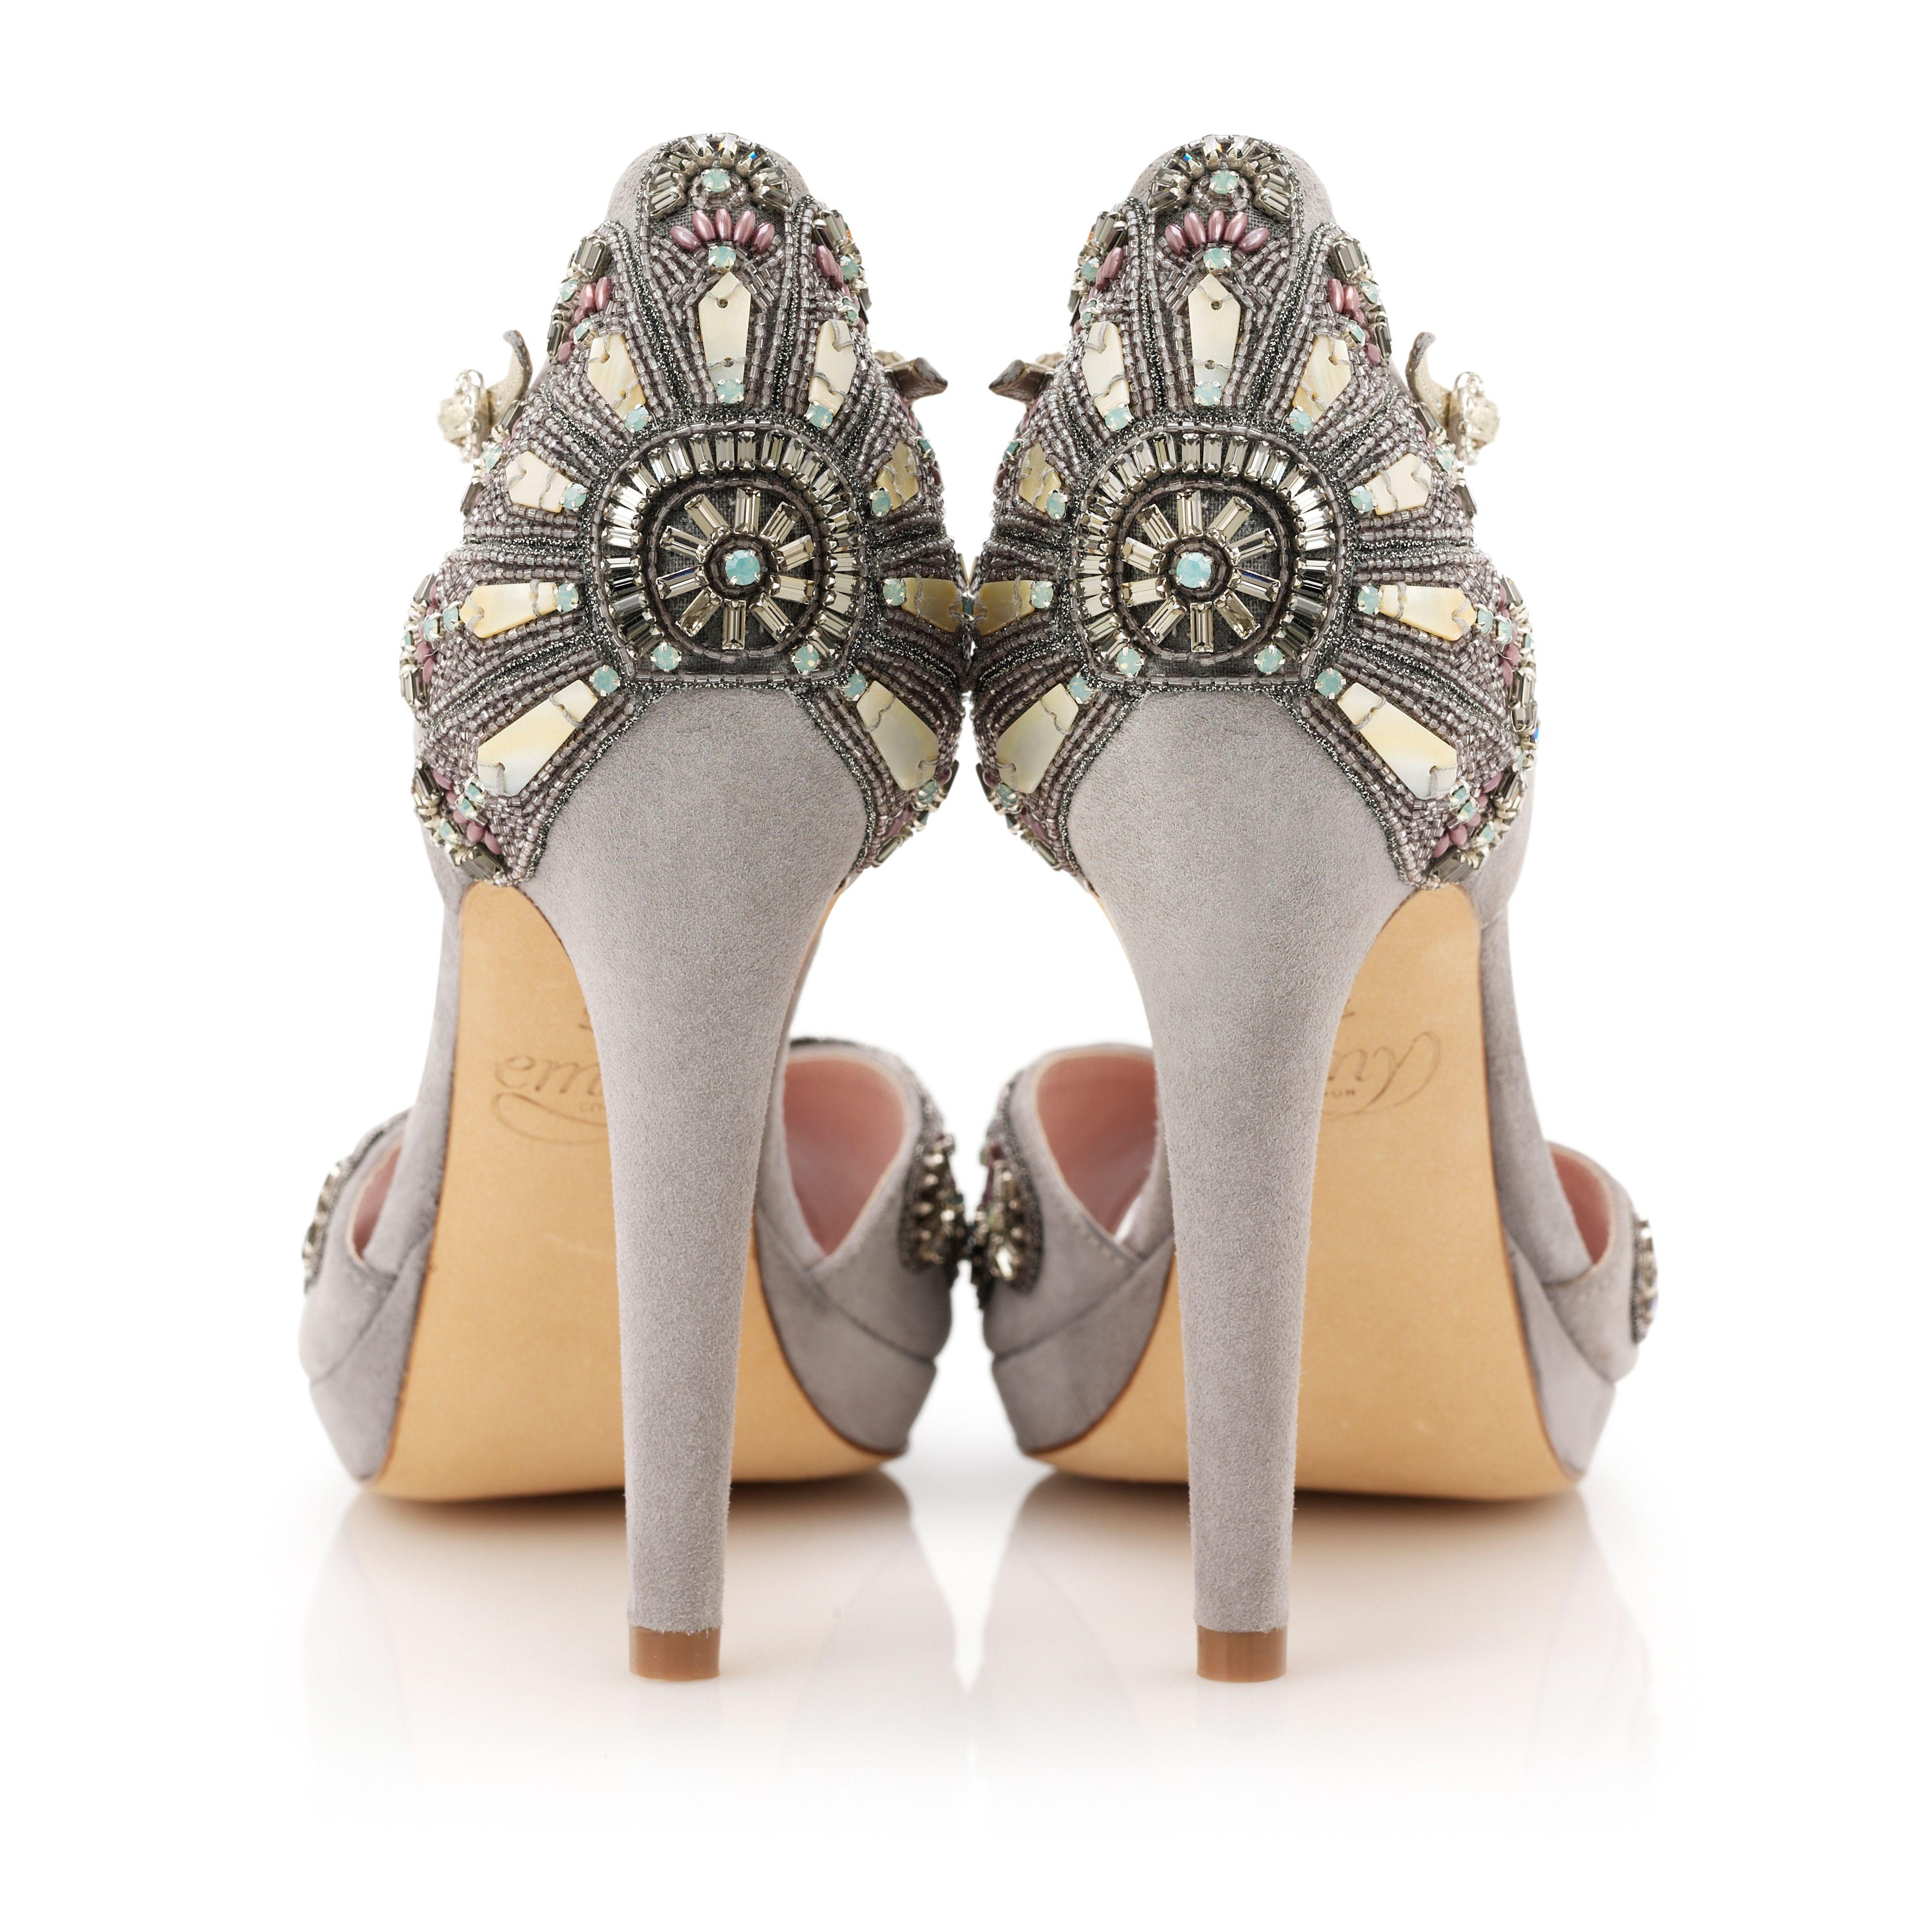 Art Deco, Suede via Emmy London | Jeweled heels, Bridal